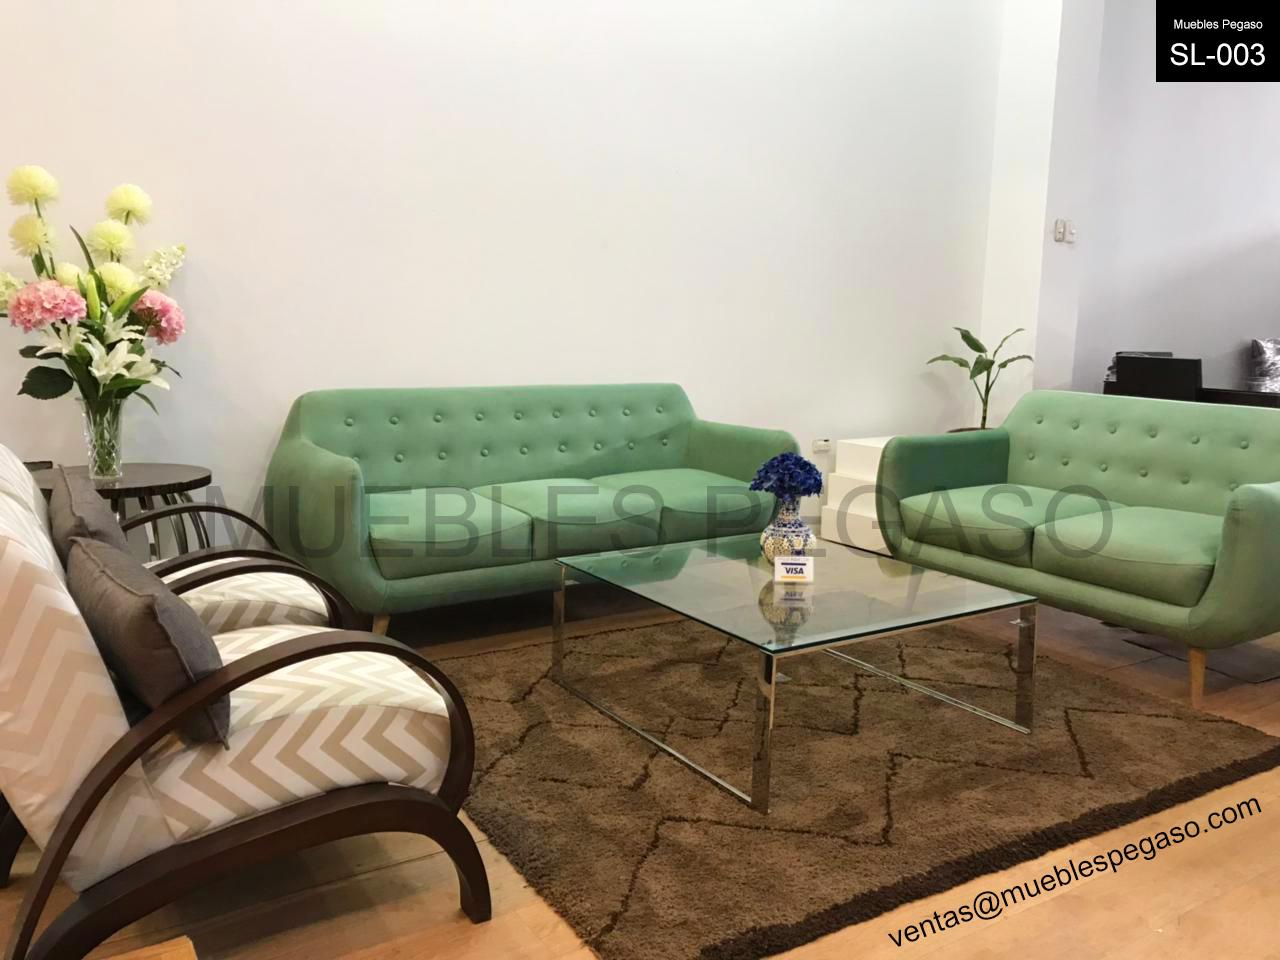 Muebles Pegaso Ultima Tendencia En Salas Modernas - Muebles-modernos-de-sala